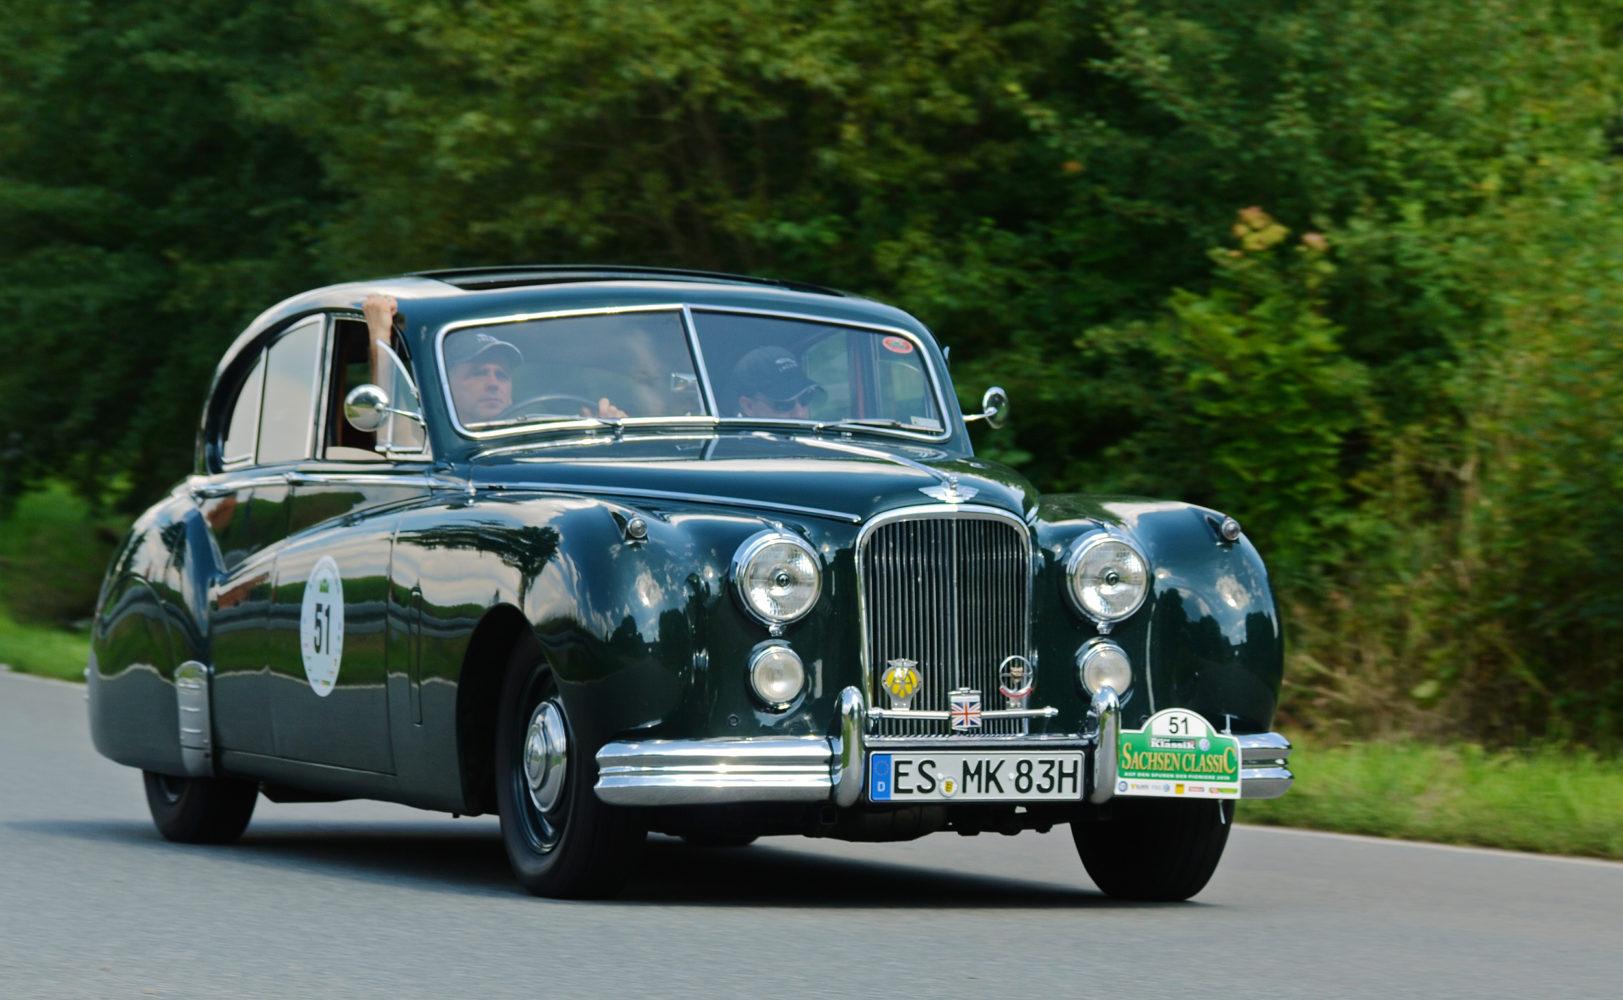 Saxony_Classic_Rallye_2010_-_Jaguar_Mark_VII_1953_(aka)